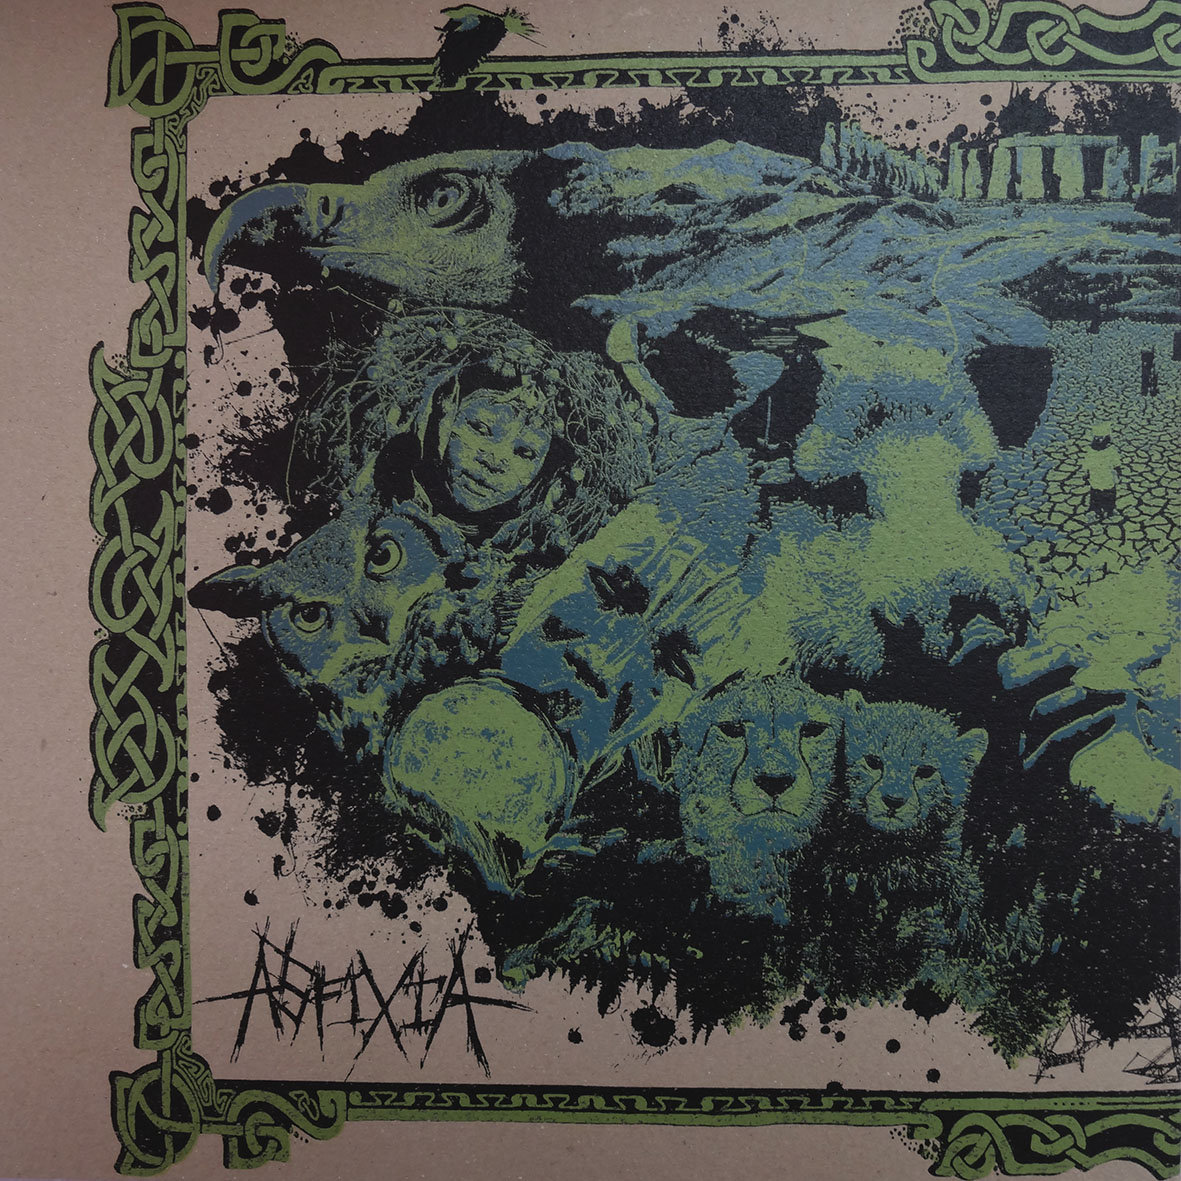 ASFIXIA / ANNUNAKI REVENGE - split LP | CONTRASZT! REC